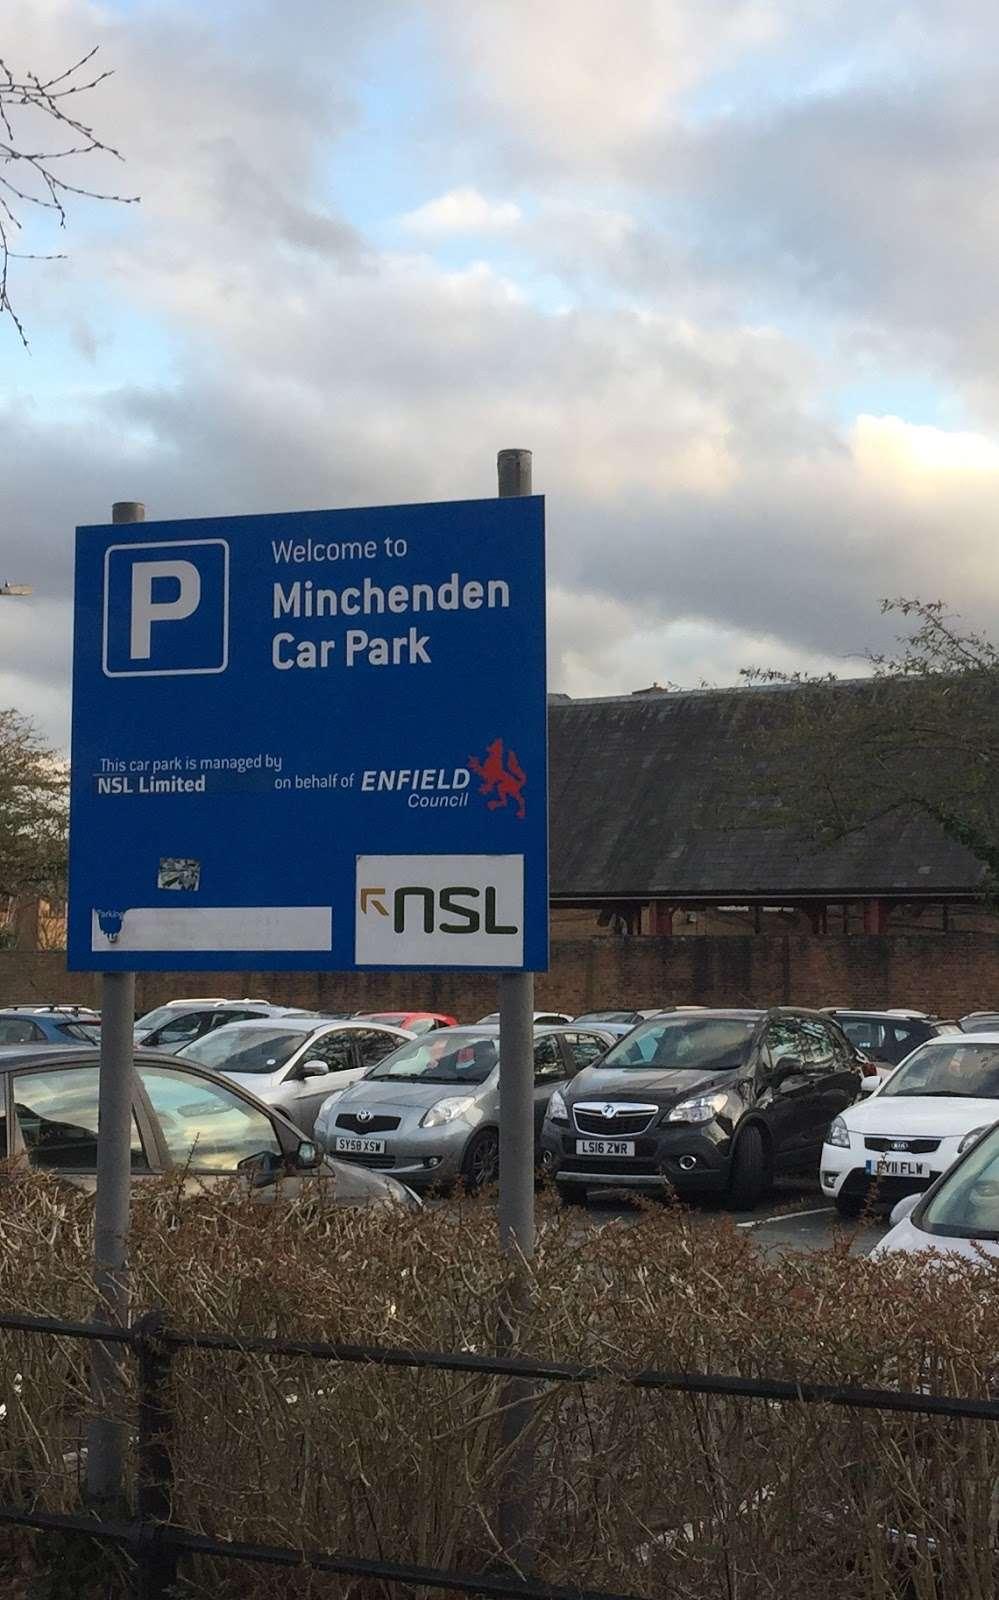 Leigh Hunt Drive Car Park - parking  | Photo 3 of 3 | Address: London N14 6BT, UK